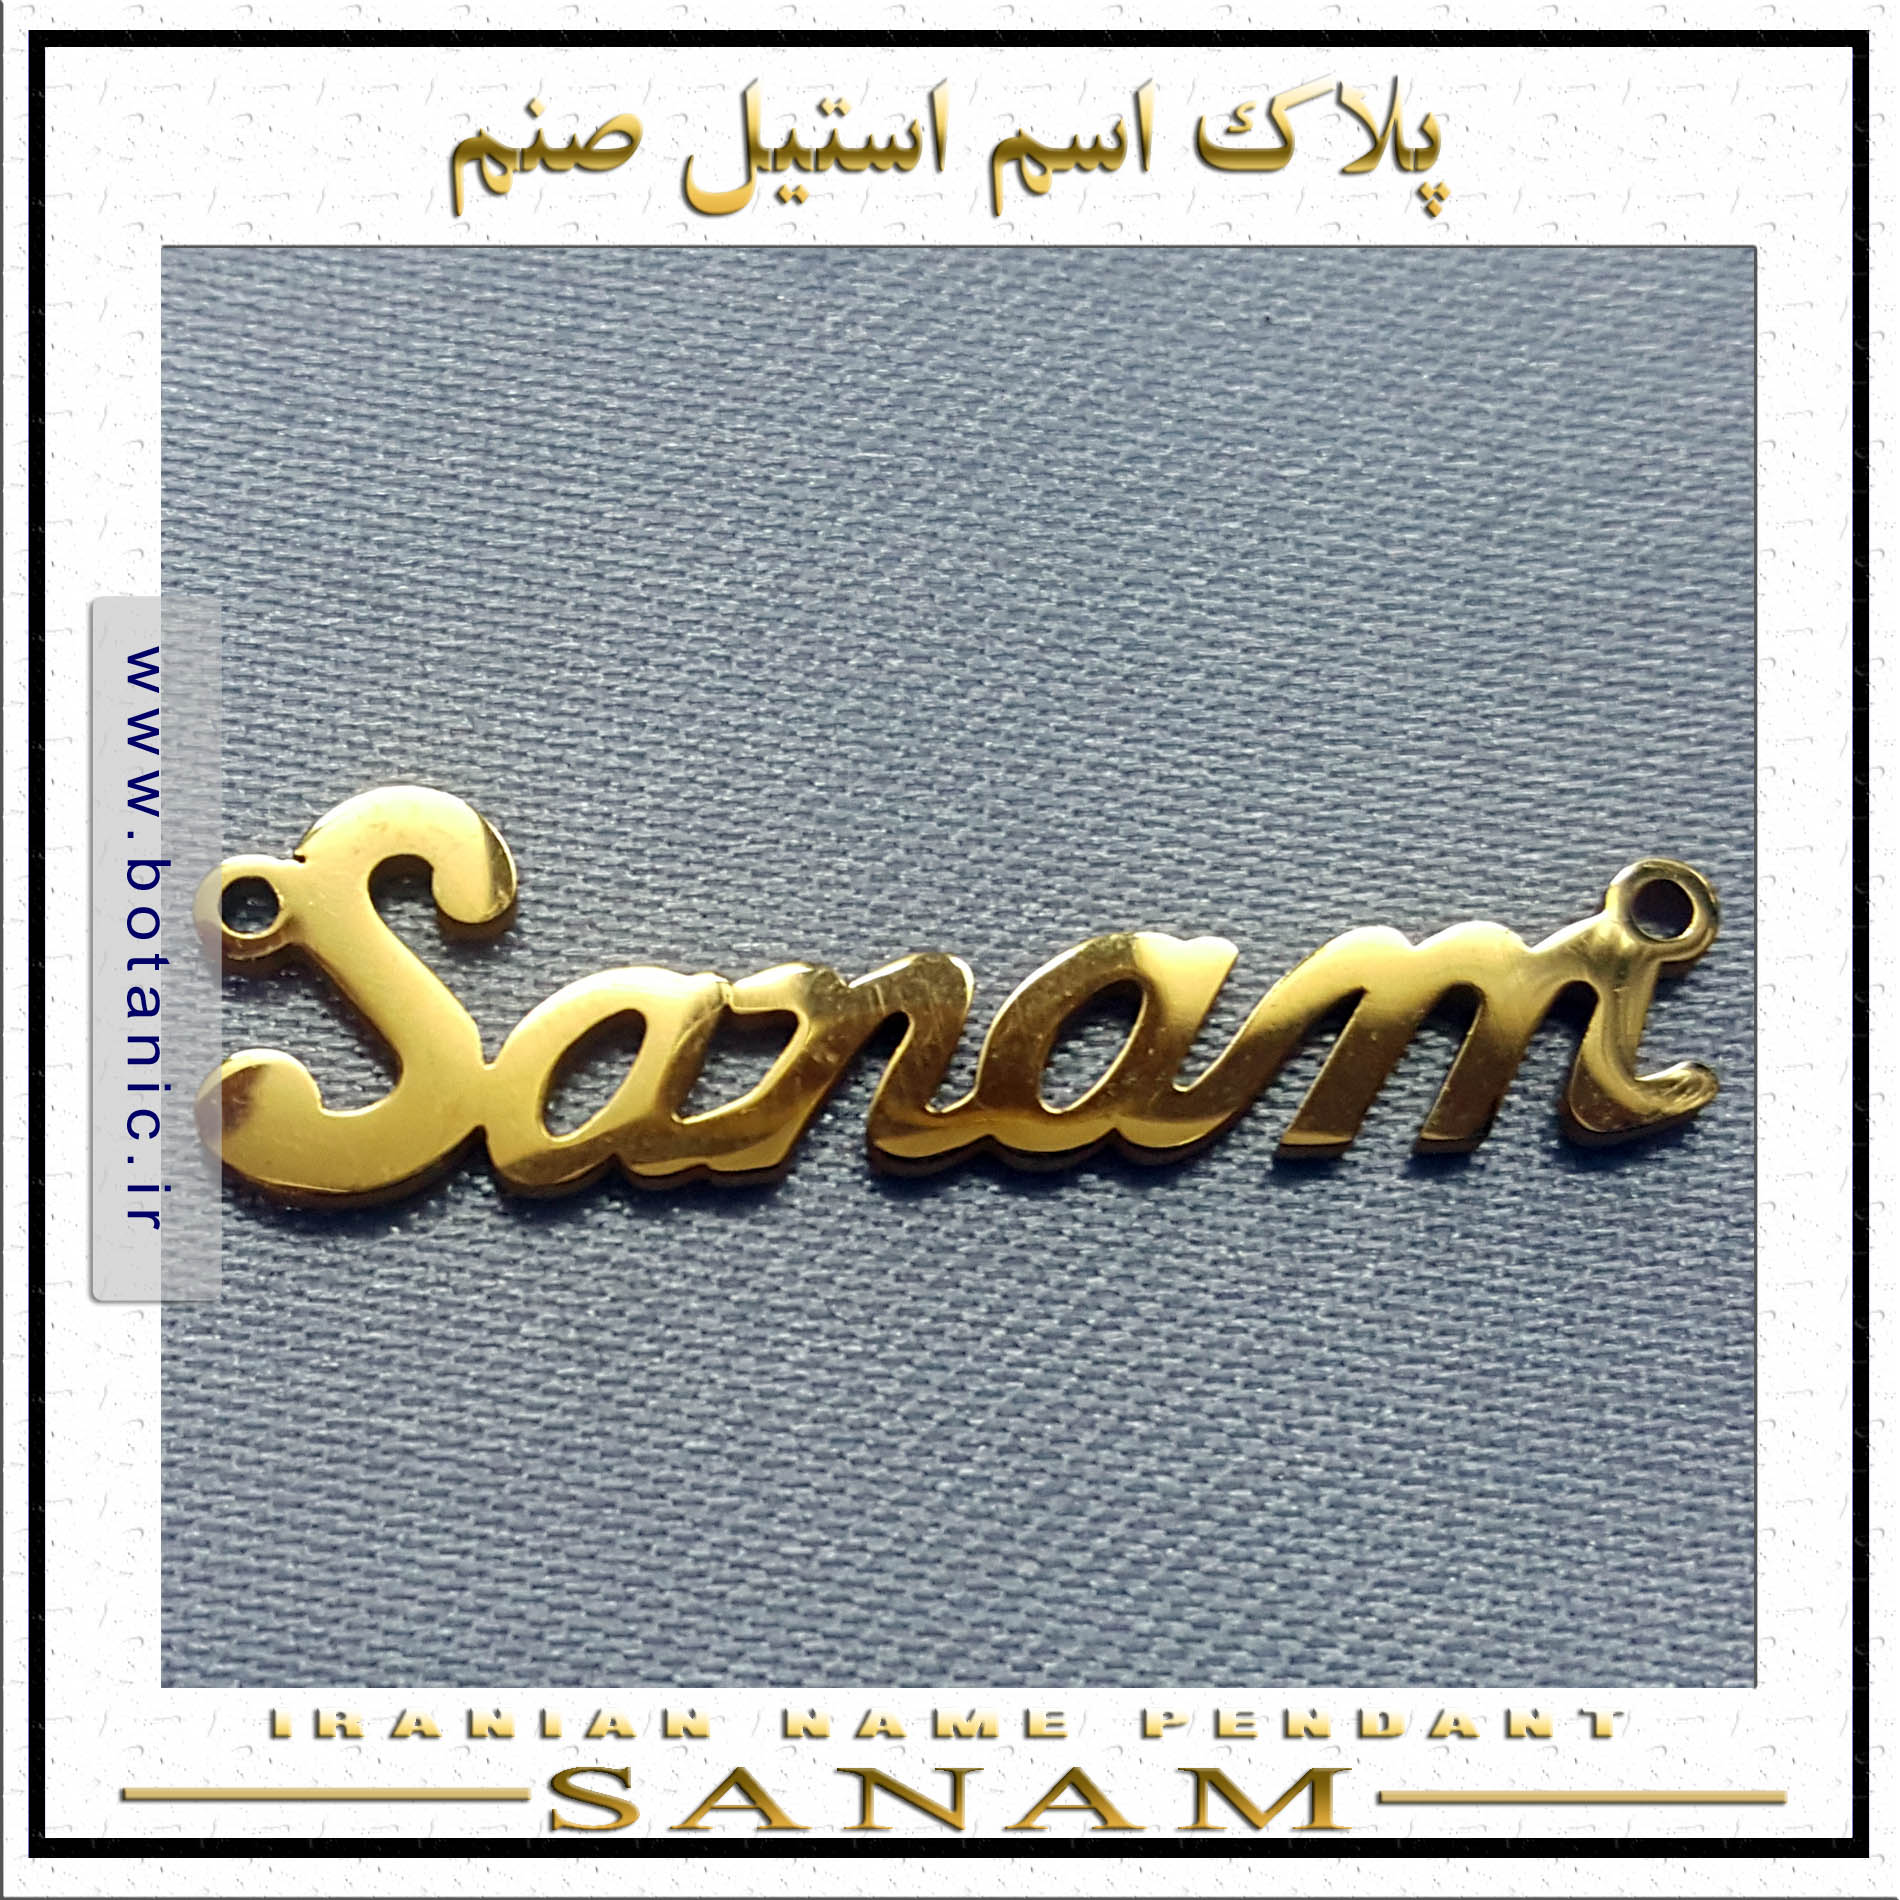 Name photo sanam Sanam (band)